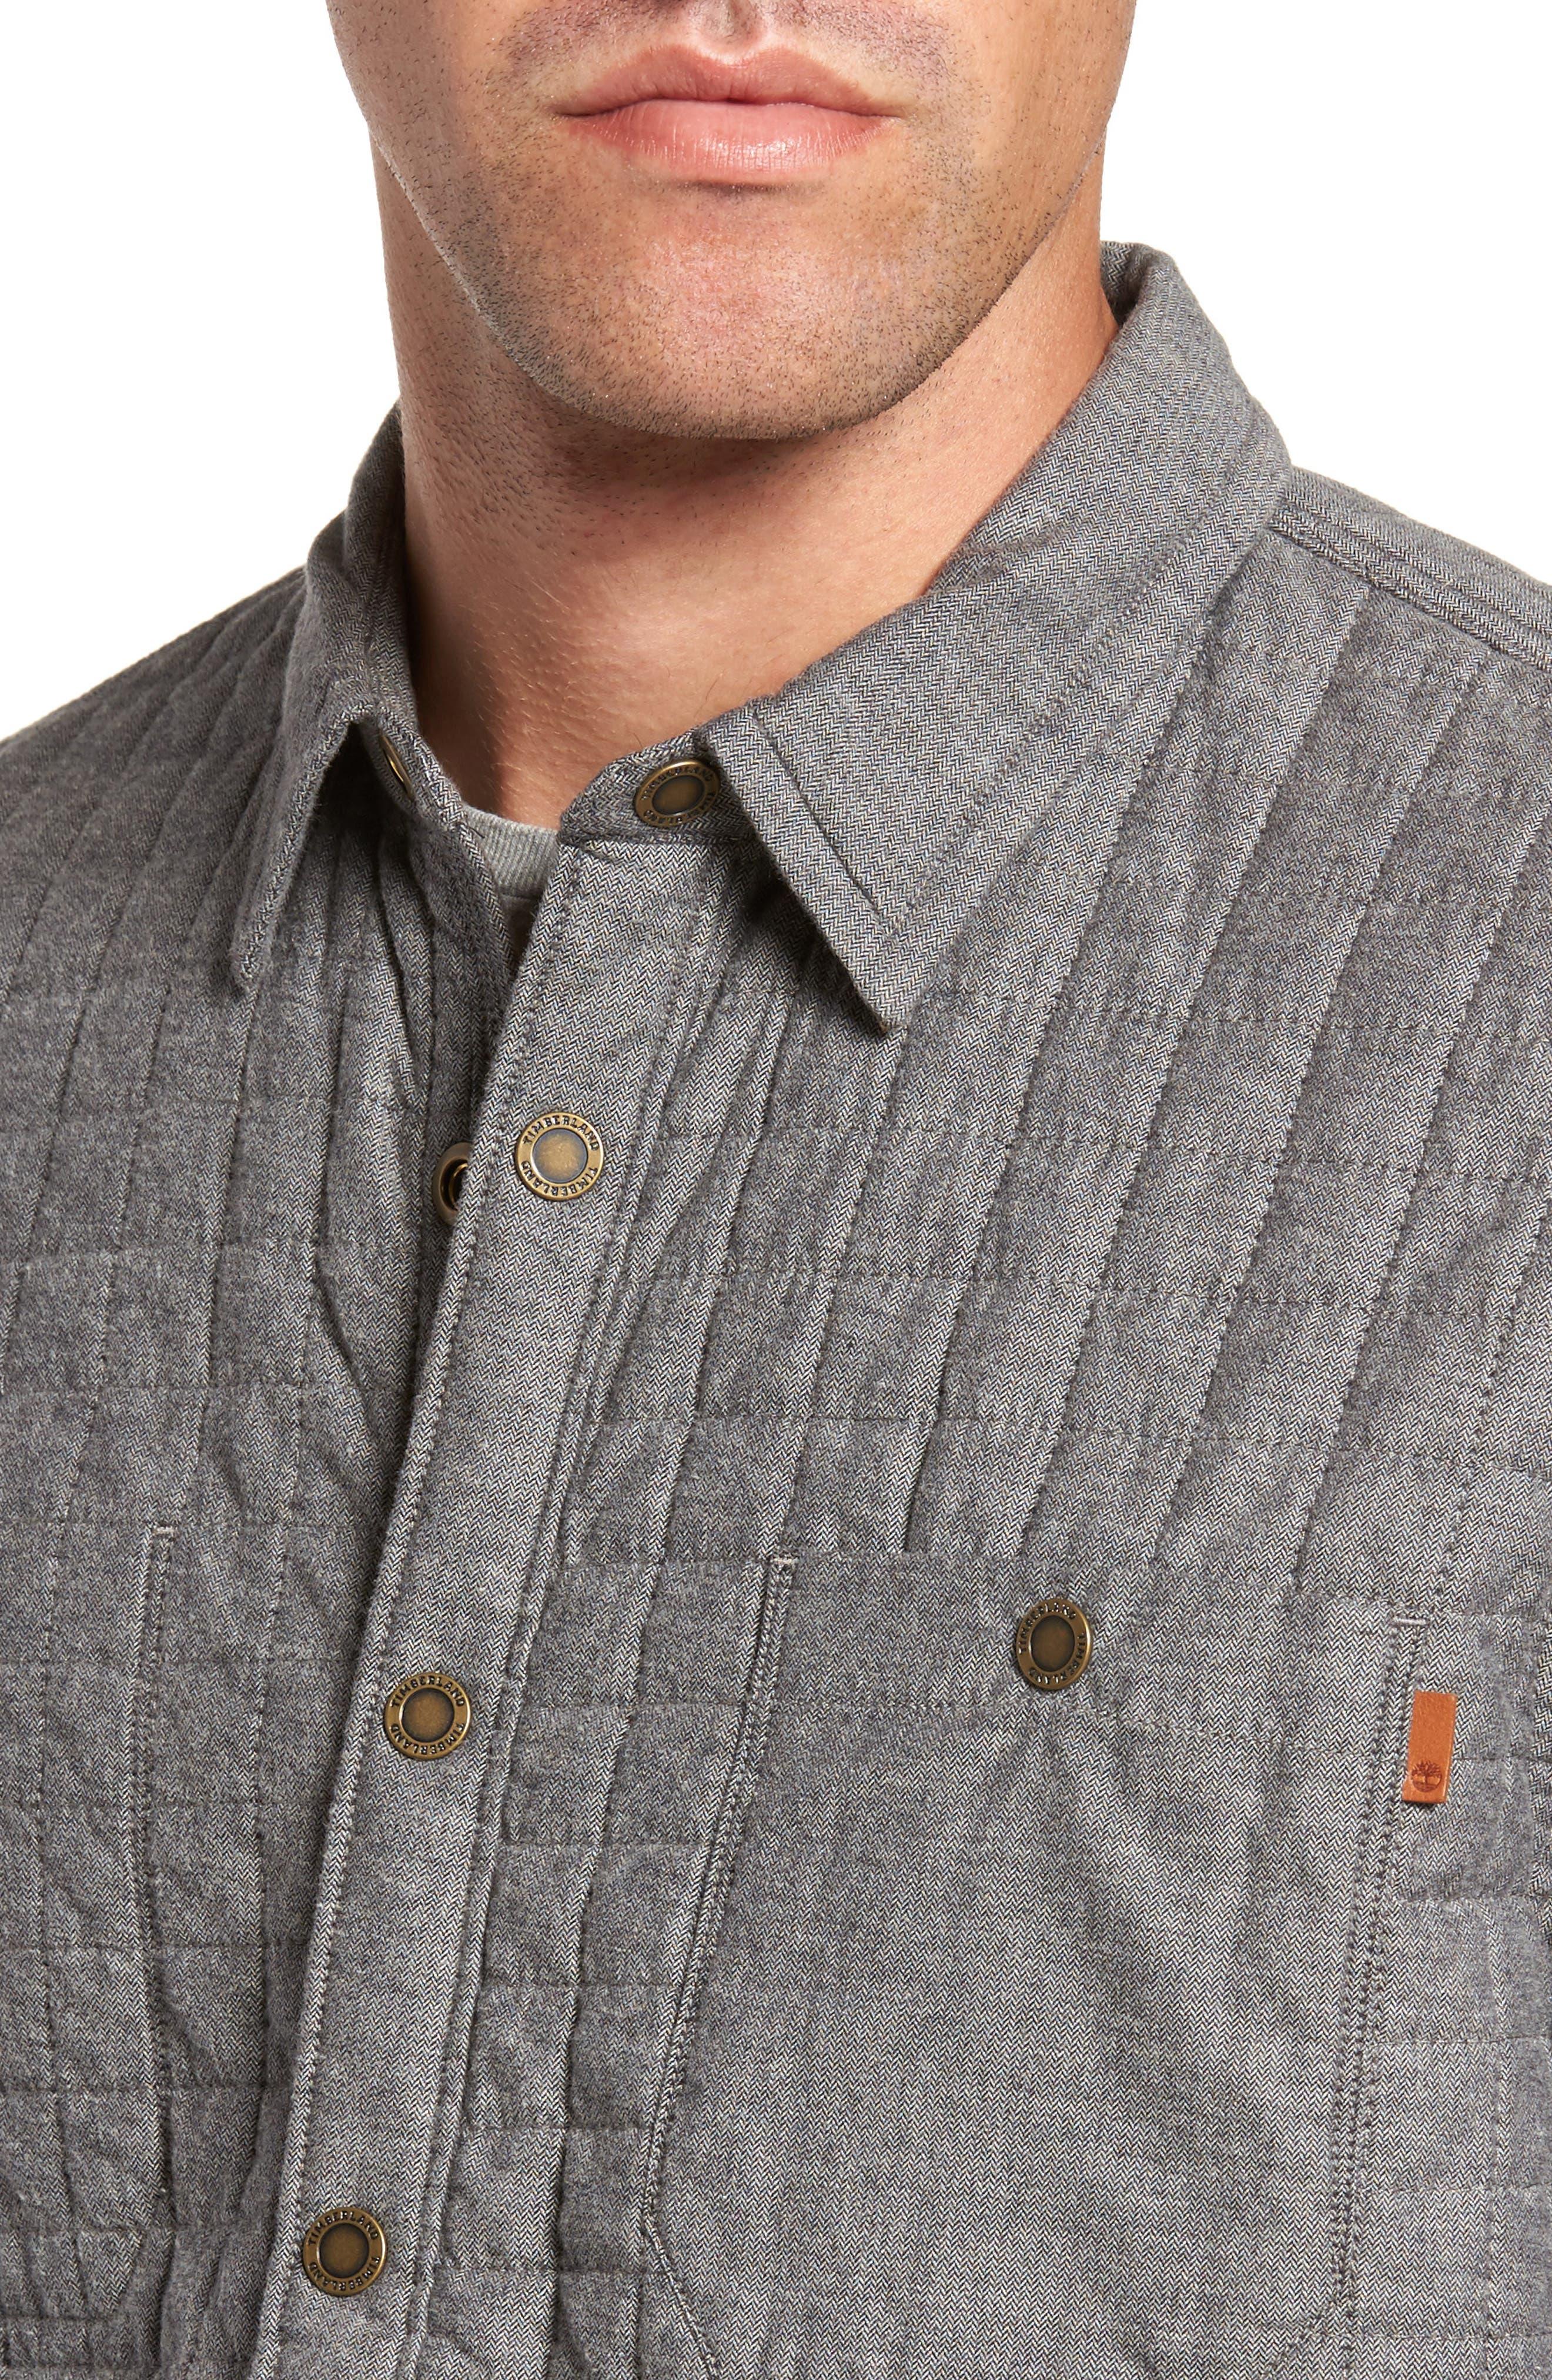 Gunstock River Lightweight Quilted Shirt Jacket,                             Alternate thumbnail 4, color,                             001